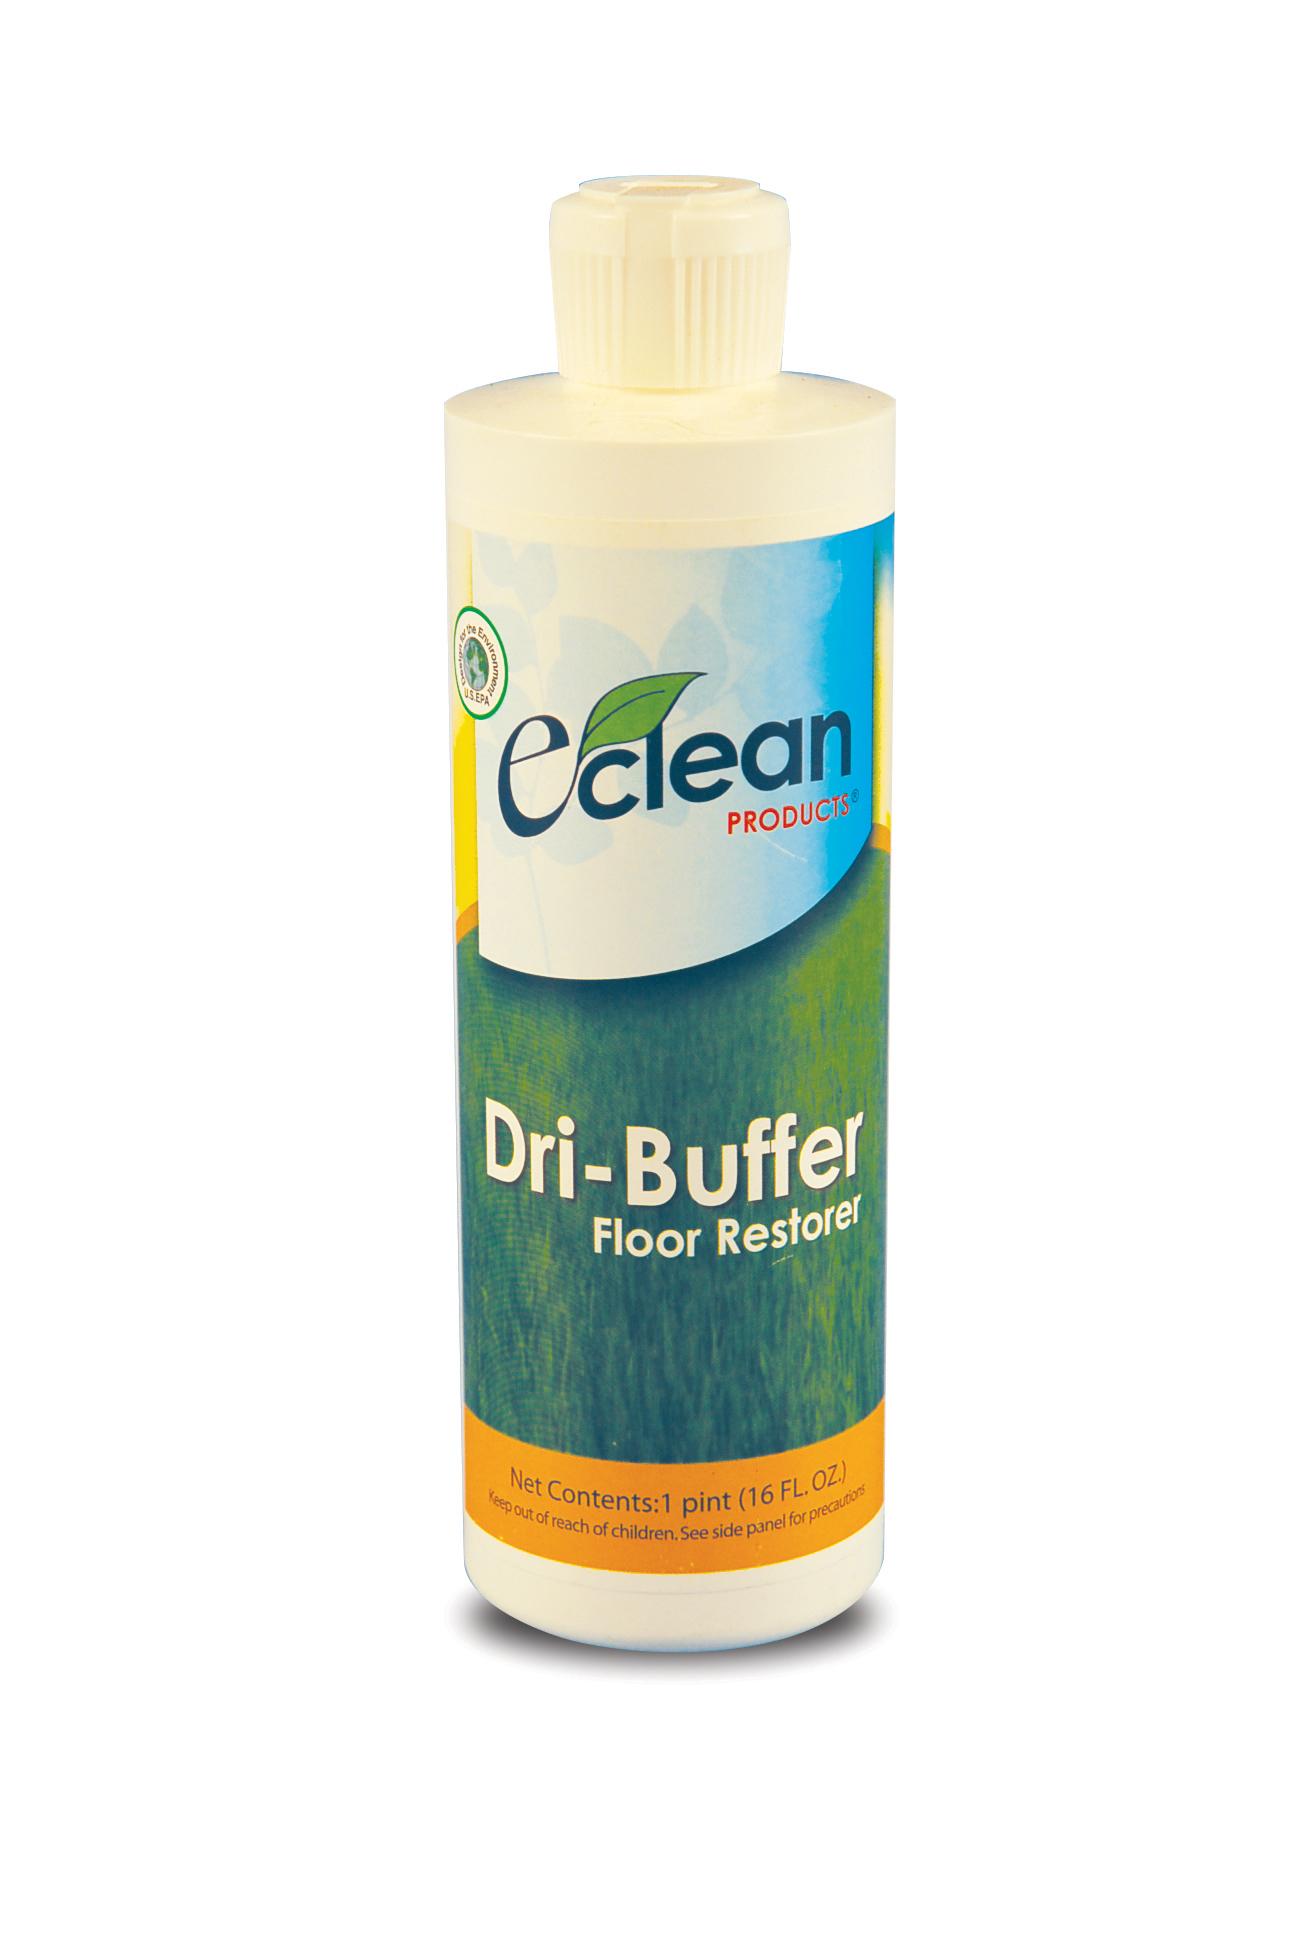 (Eclean) Dri-Buffer pic (CUT).jpg